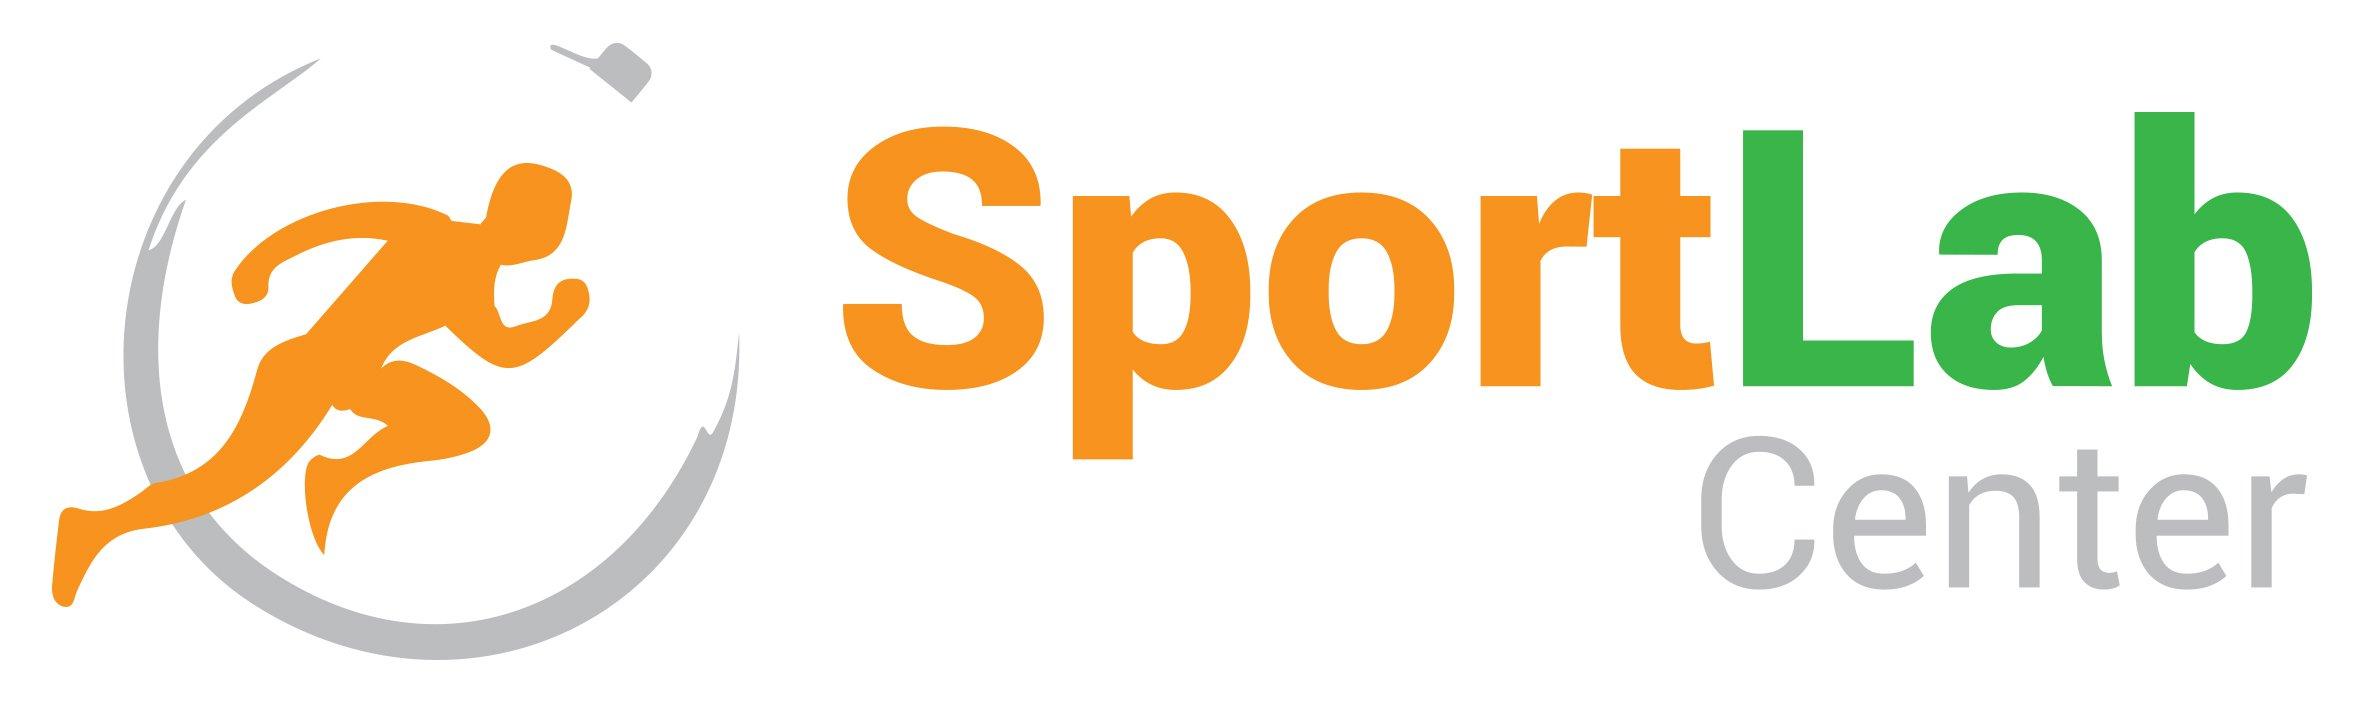 SportLab Center